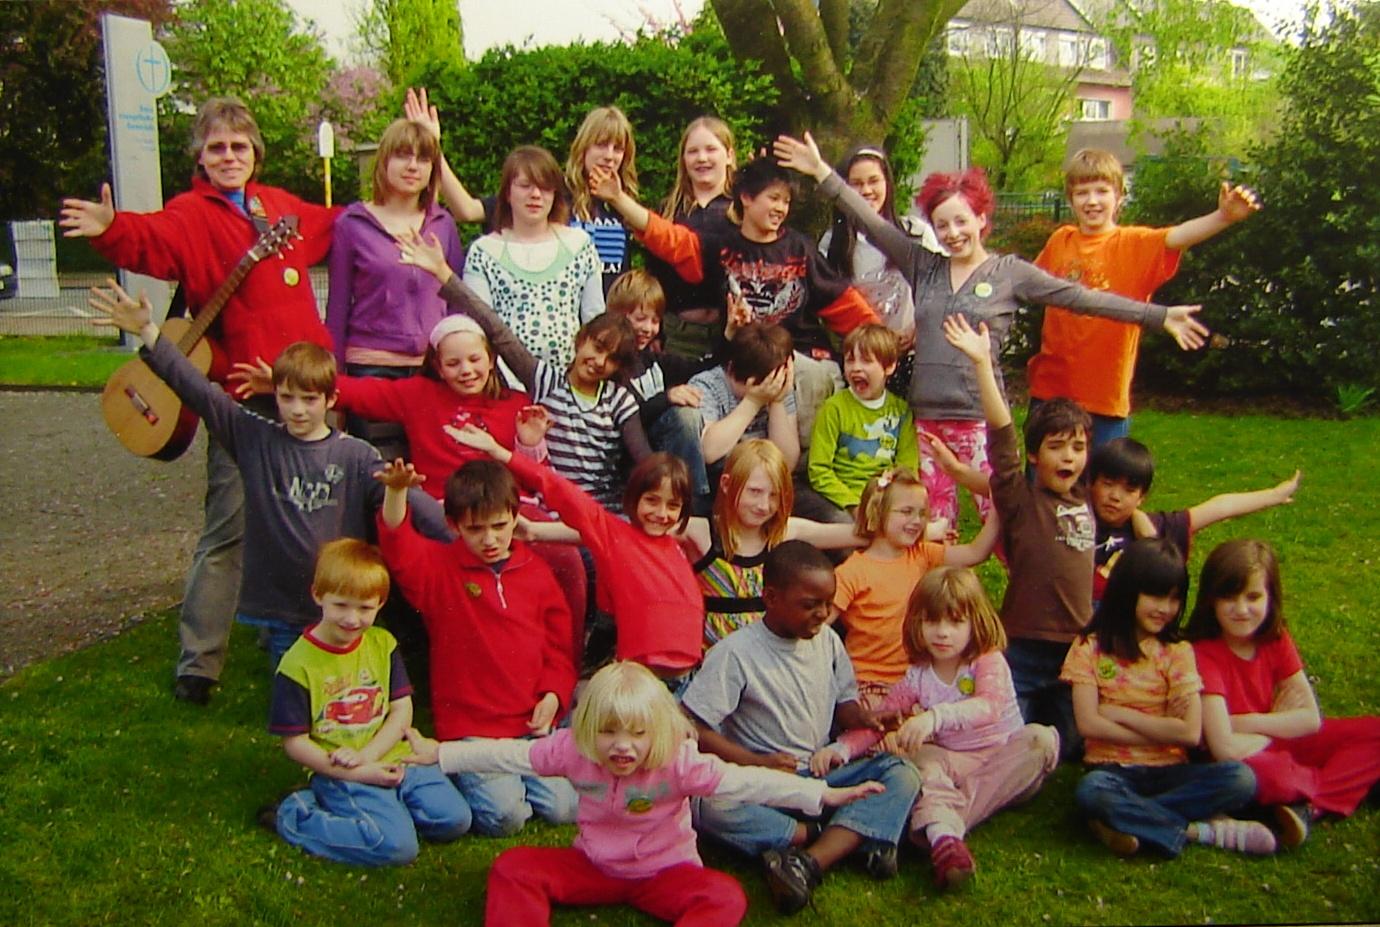 Sonni Maier: Kindertheaterwoche Oberhausen